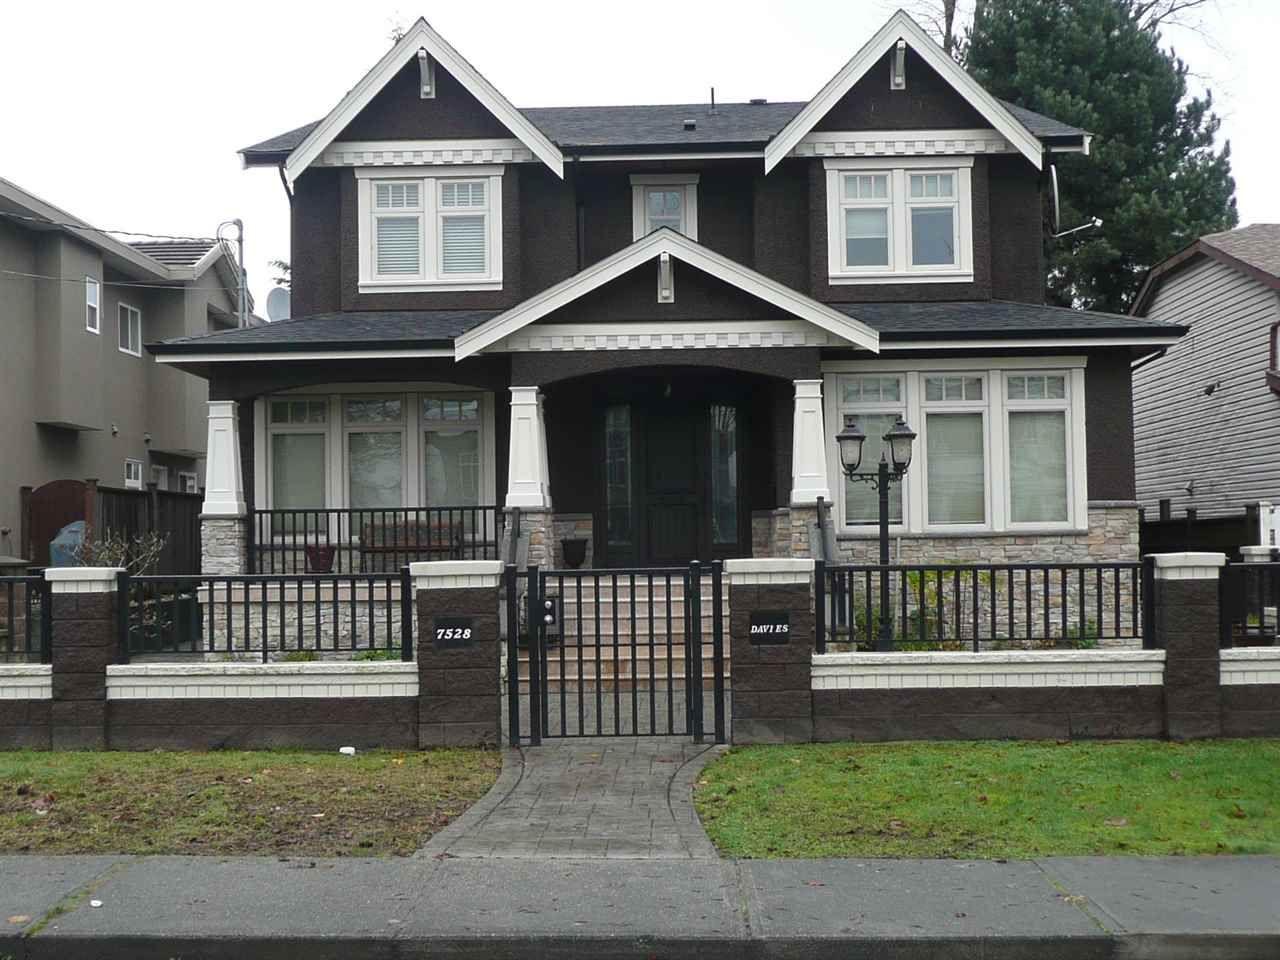 Main Photo: 7528 DAVIES Street in Burnaby: Edmonds BE House for sale (Burnaby East)  : MLS®# R2123818